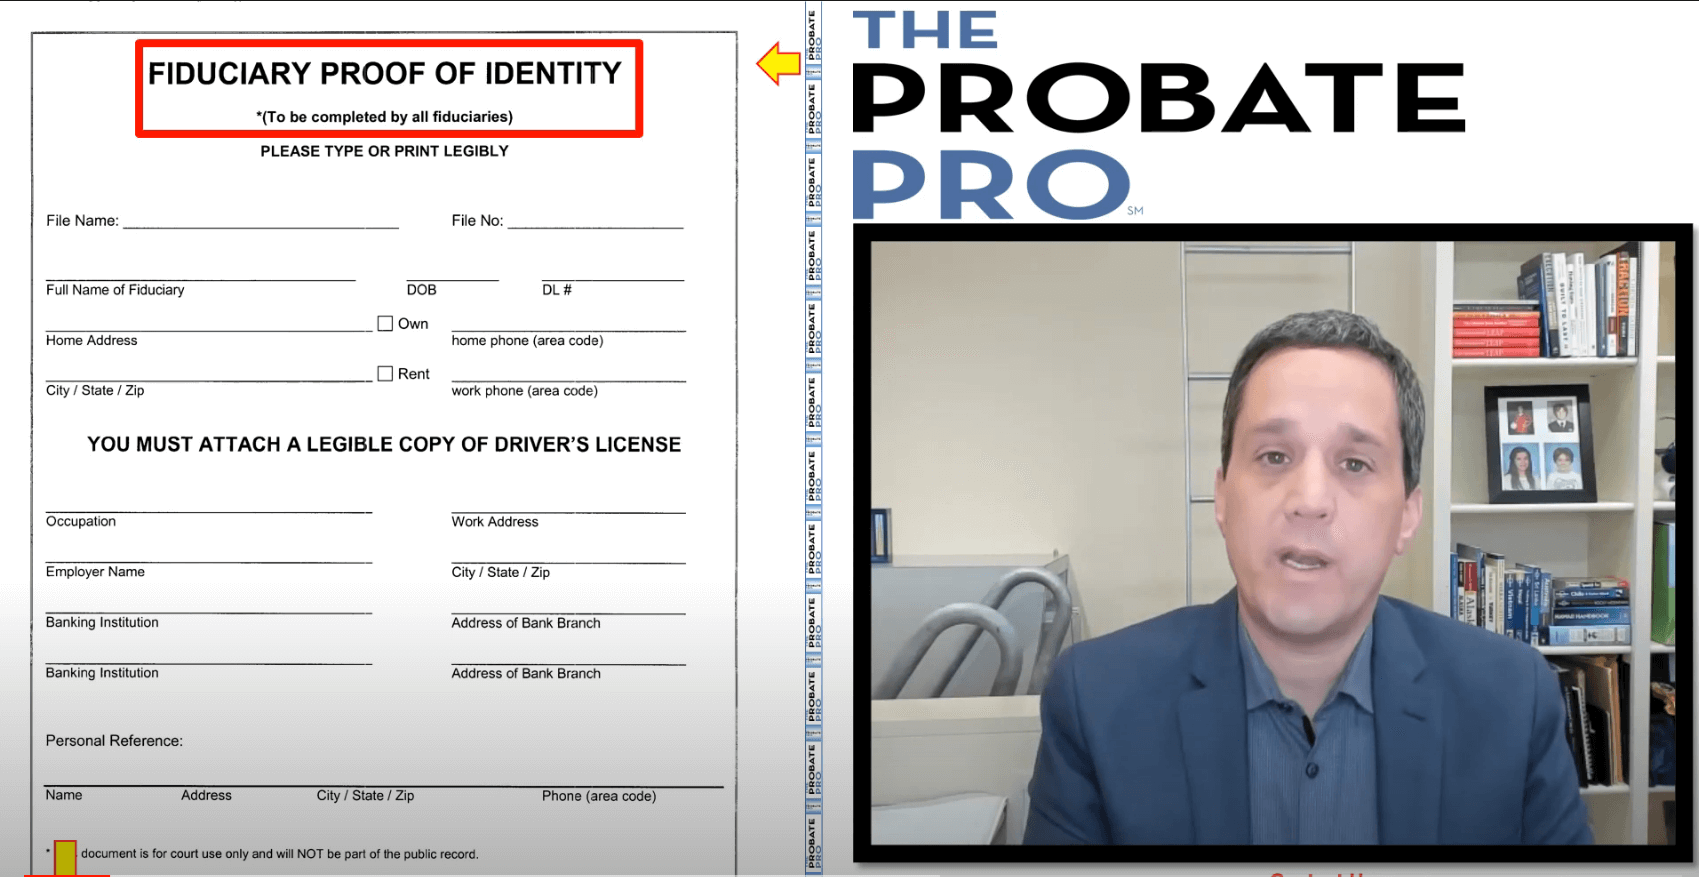 Fiduciary Proof of Identity